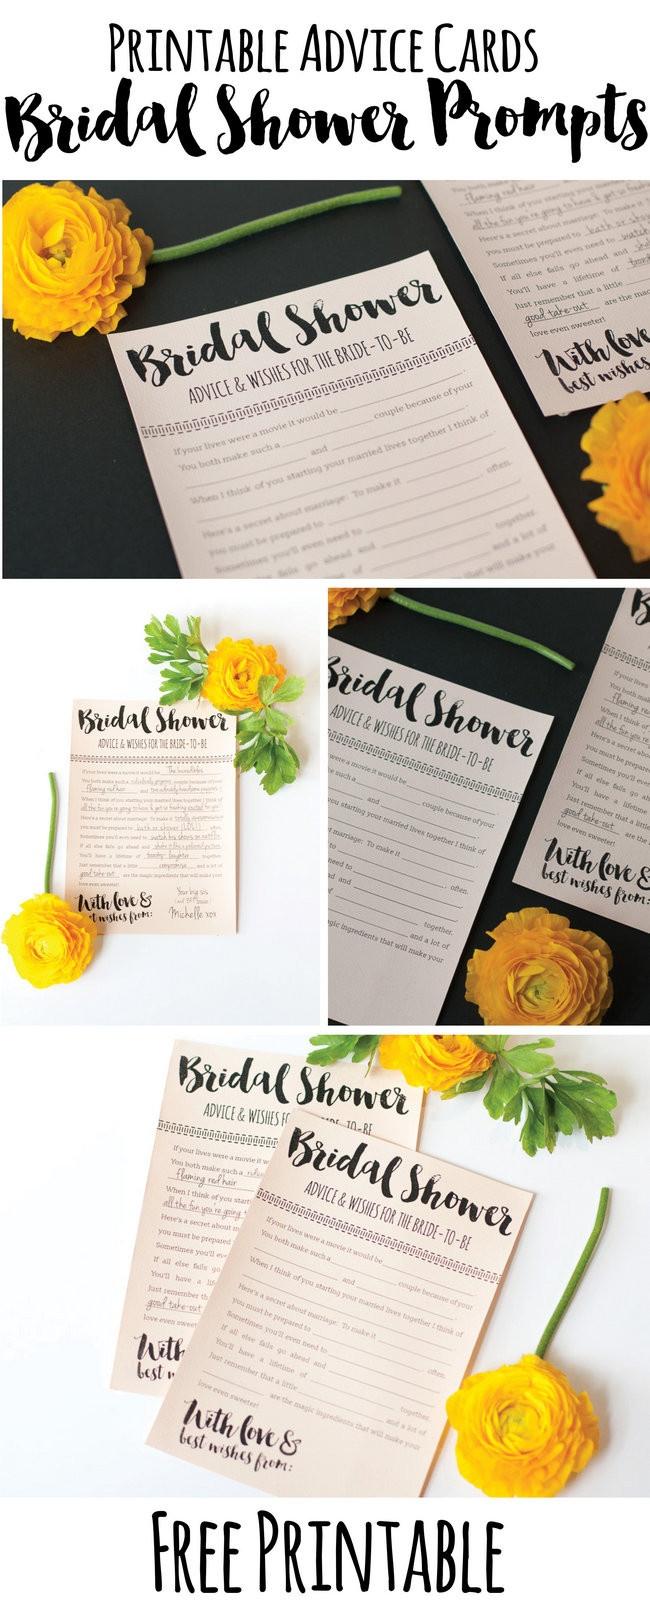 Fun Printable Bridal Shower Advice Cards - Free Download ? - Free Printable Bridal Shower Advice Cards